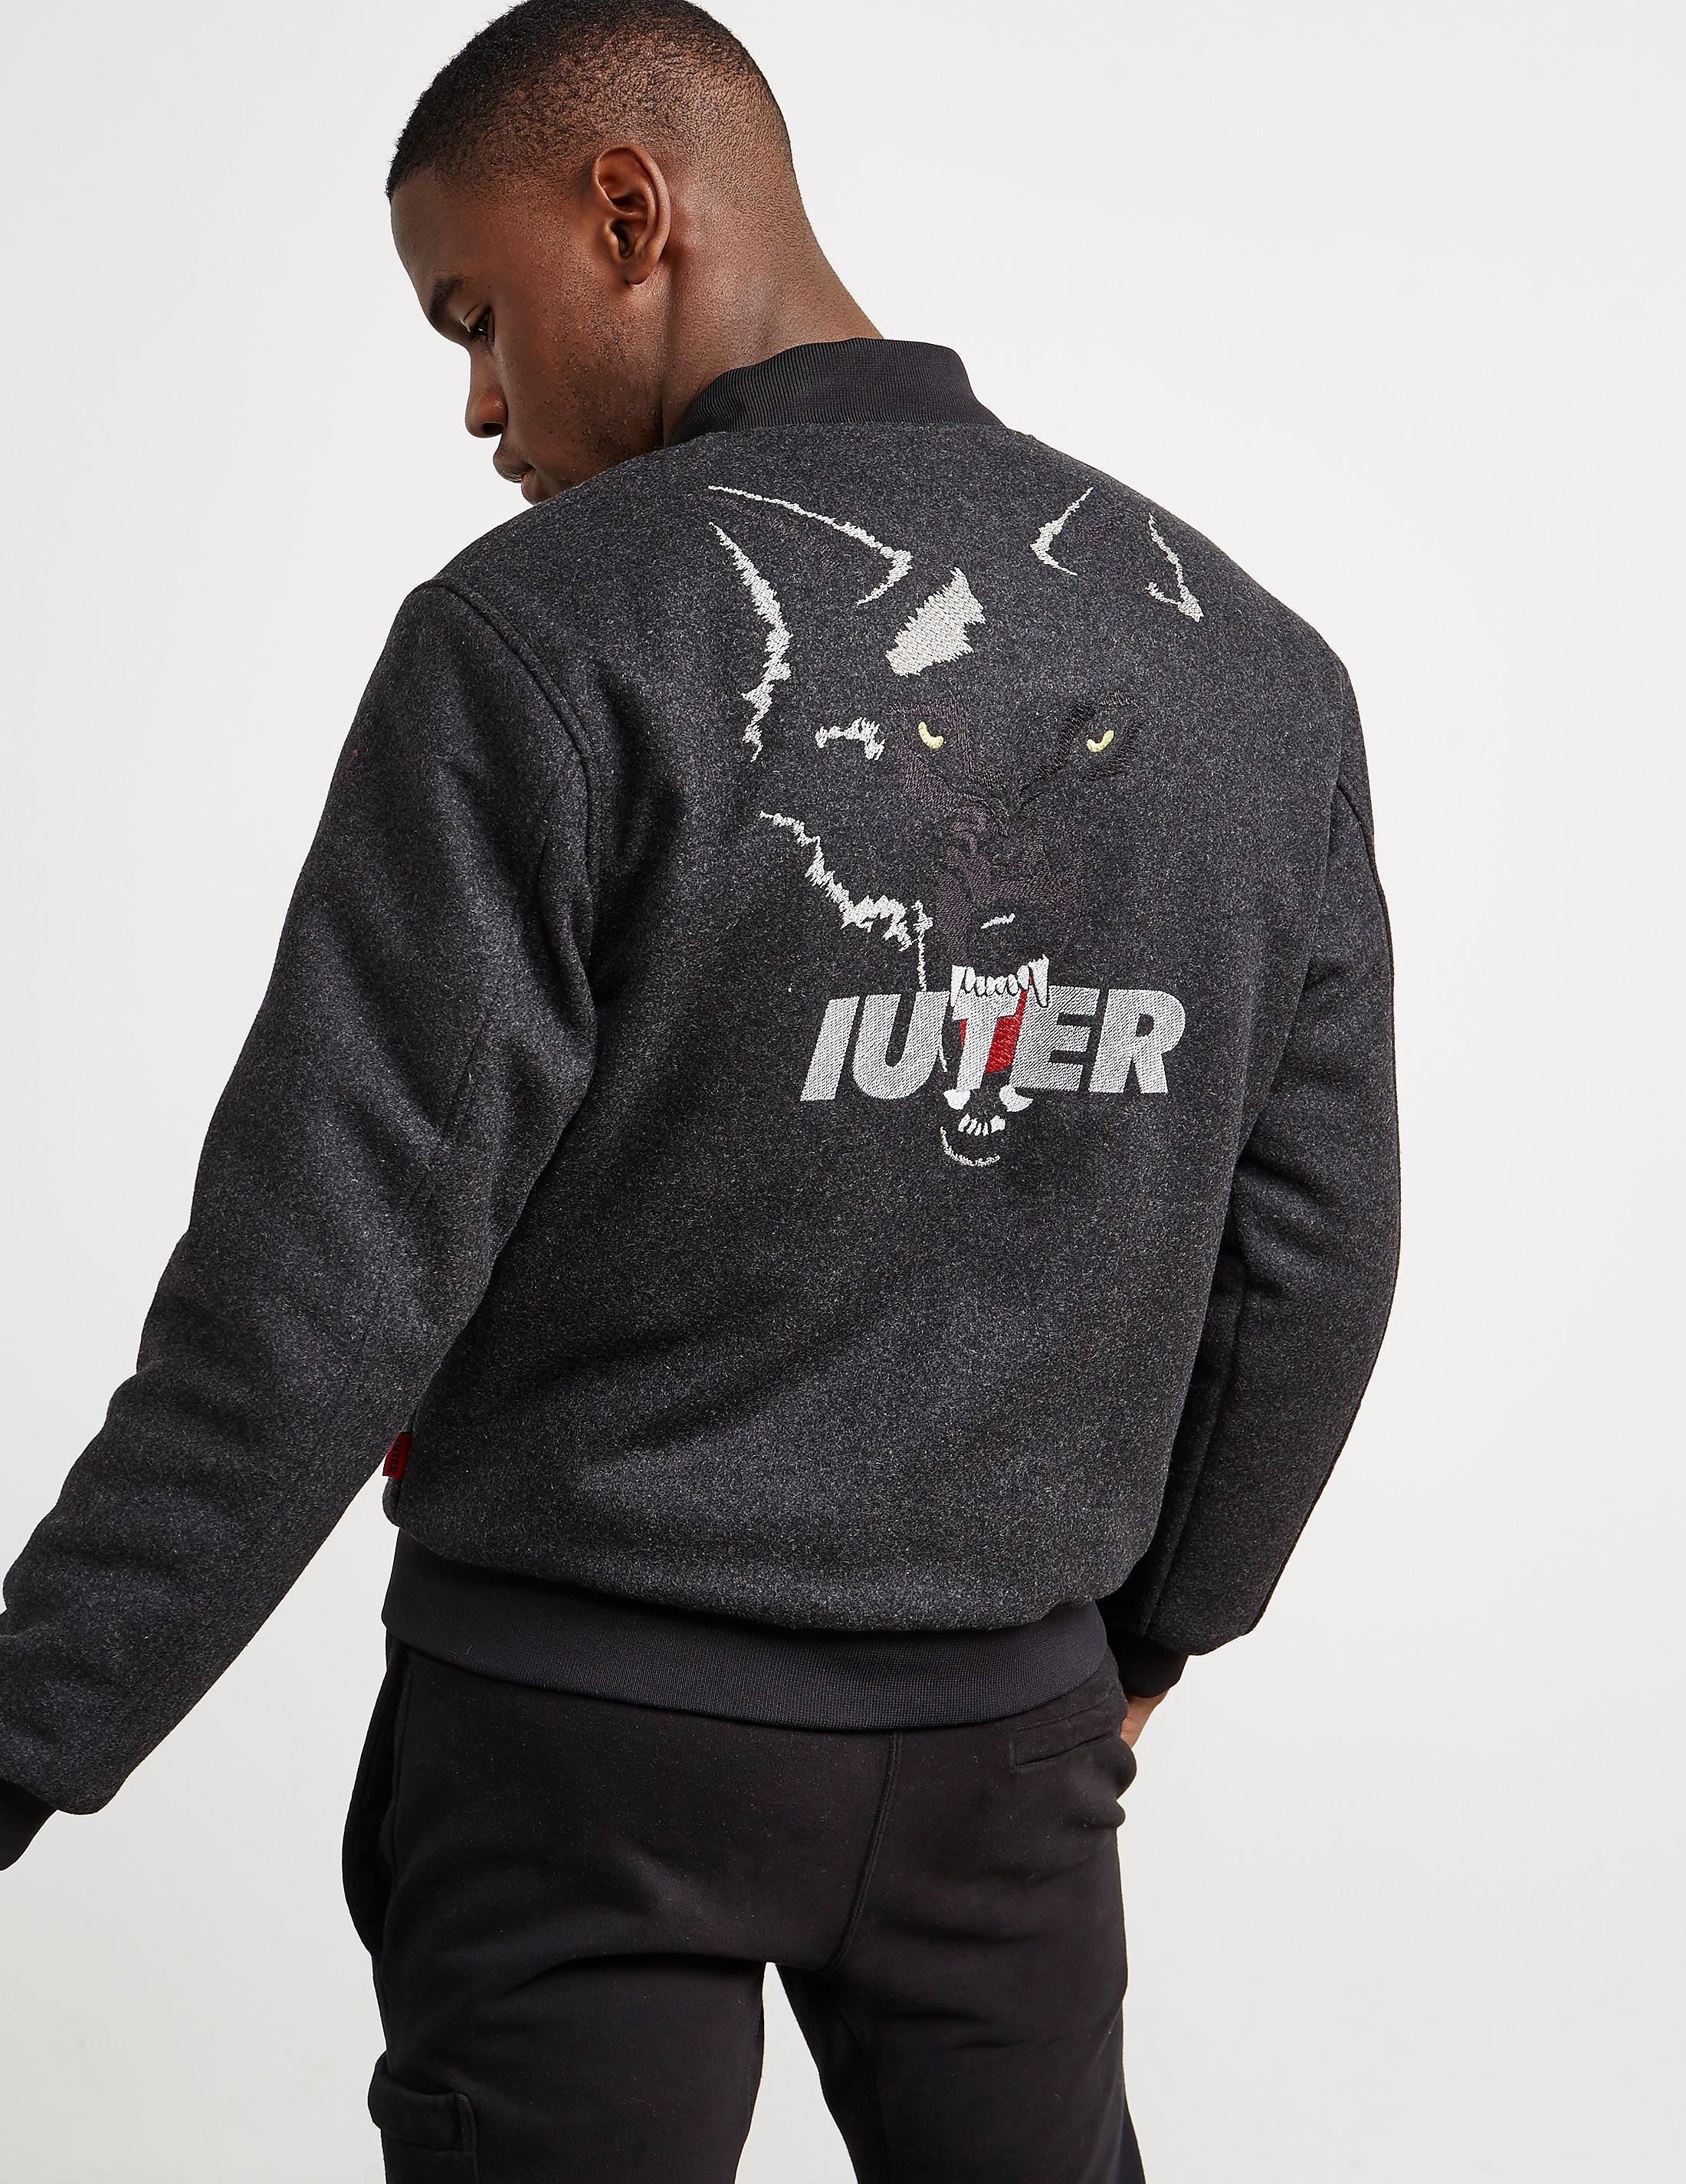 IUTER Growl Padded Bomber Jacket - Exclusive